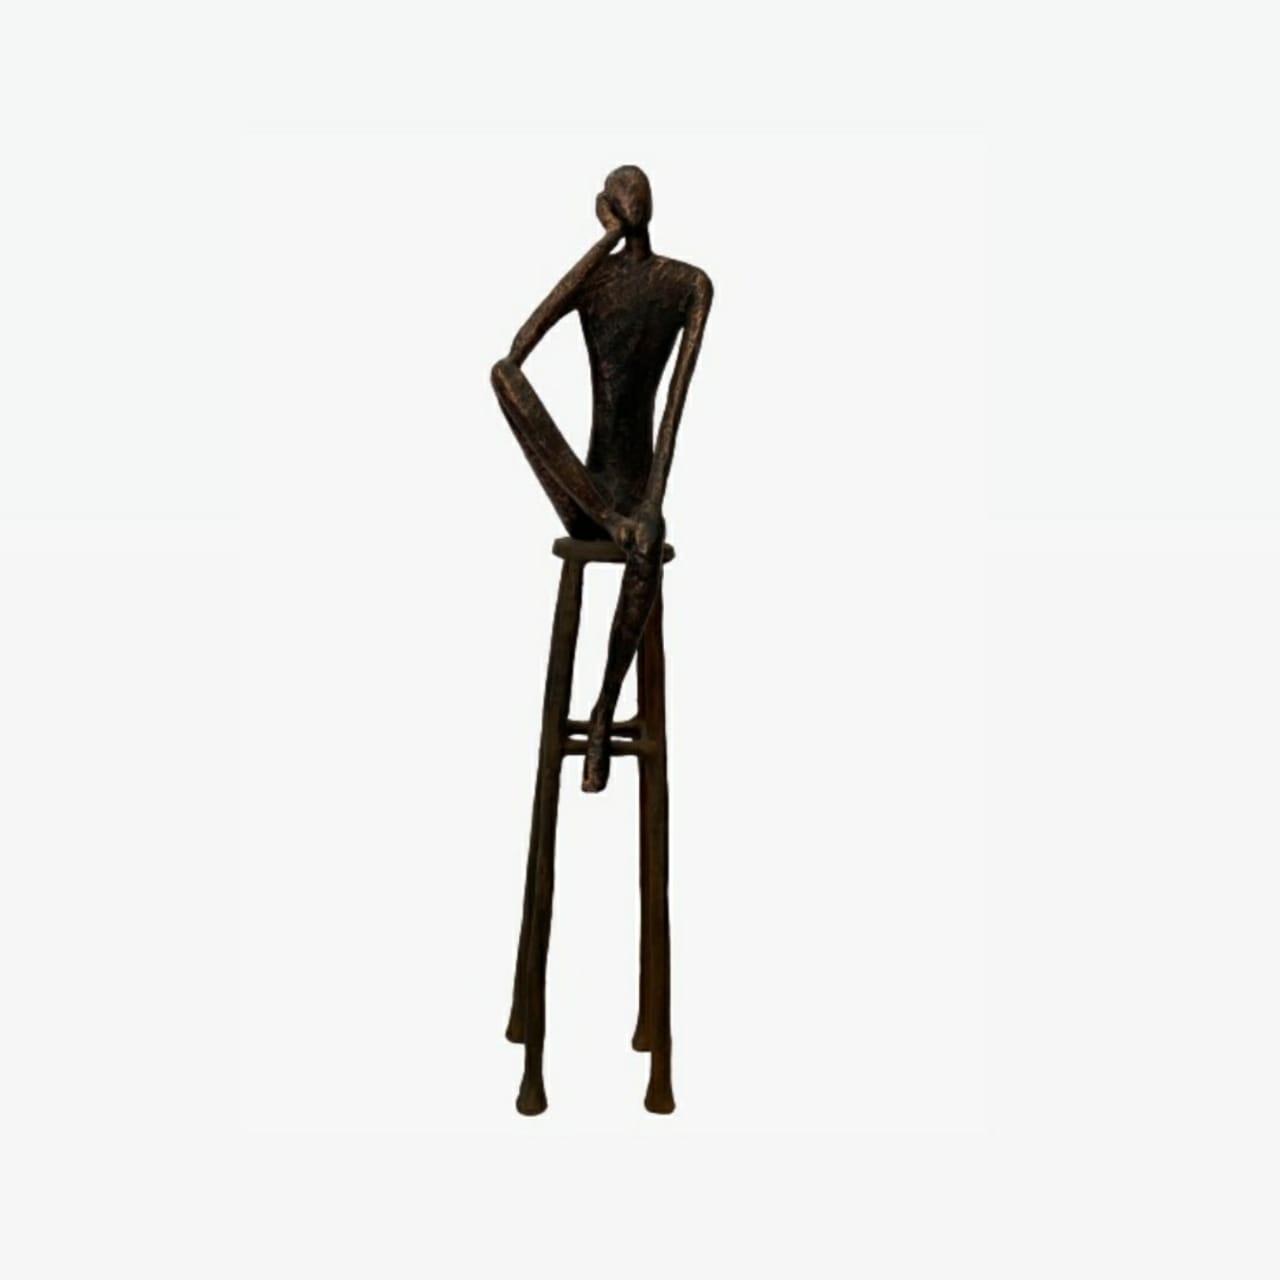 Escultura Homem no Banco Grande